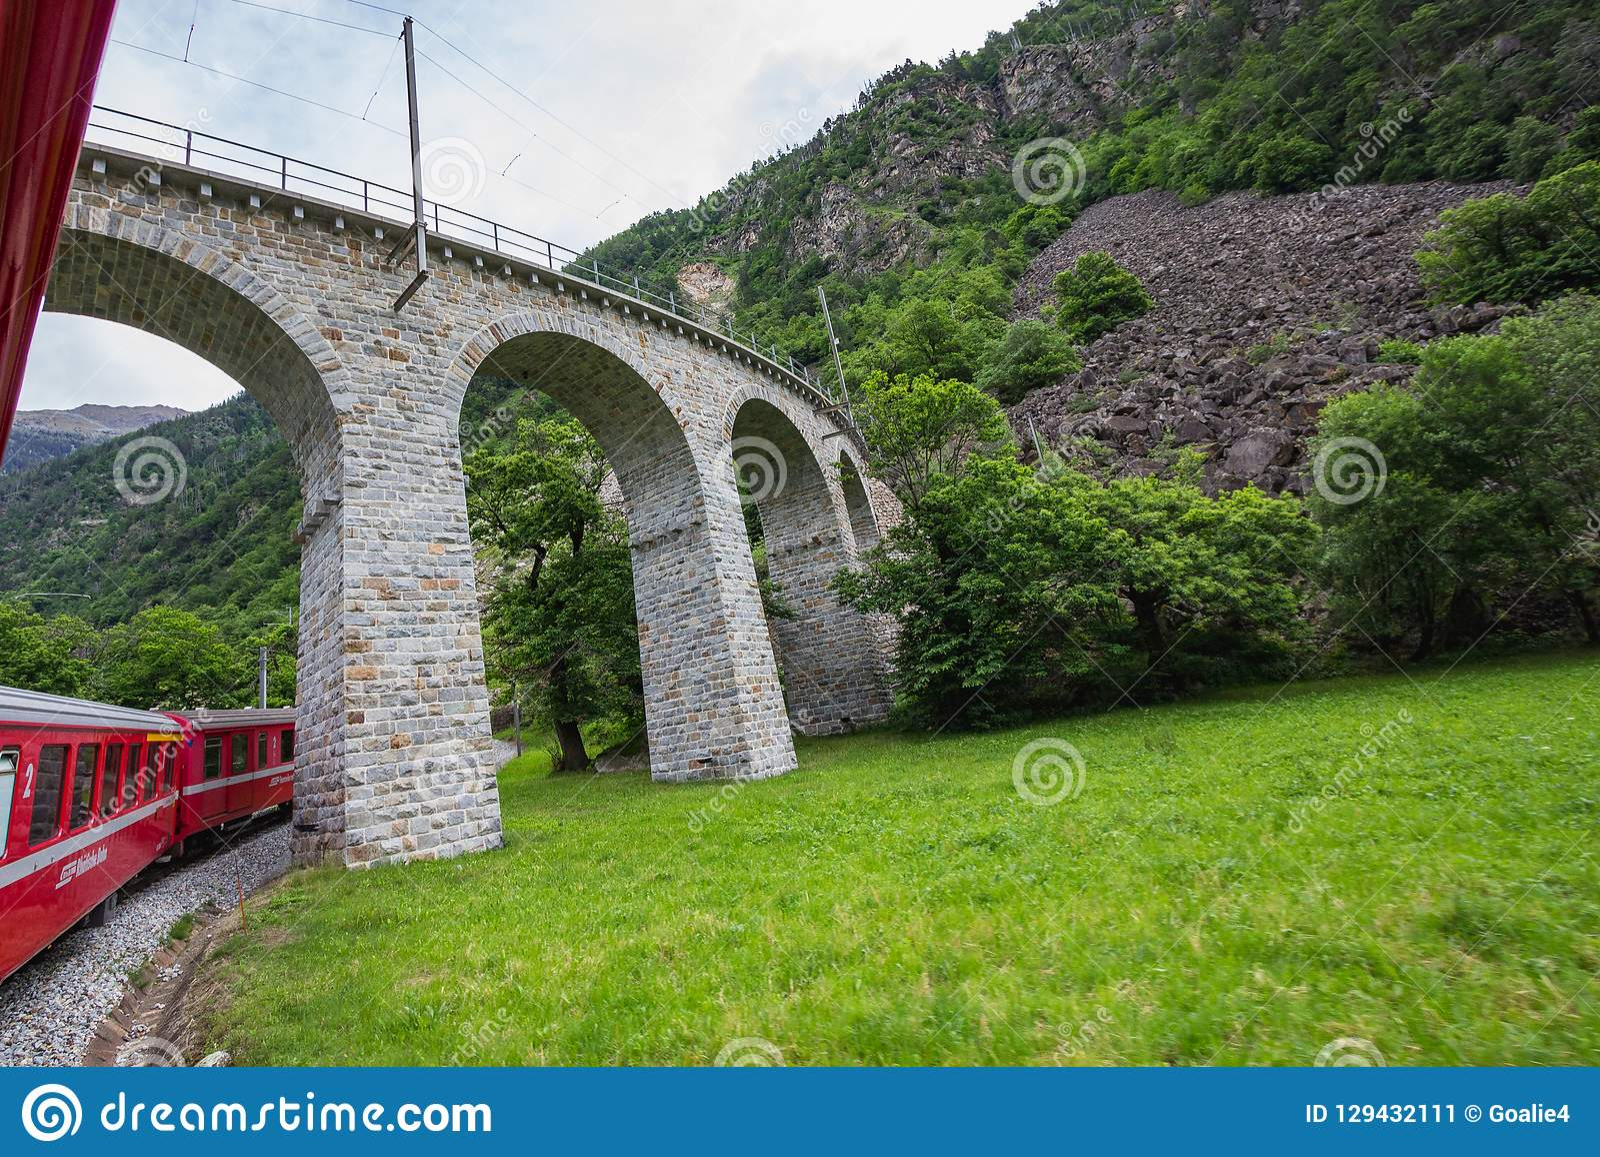 Rhaetian Railway crossing a bridge in the Surselva valley